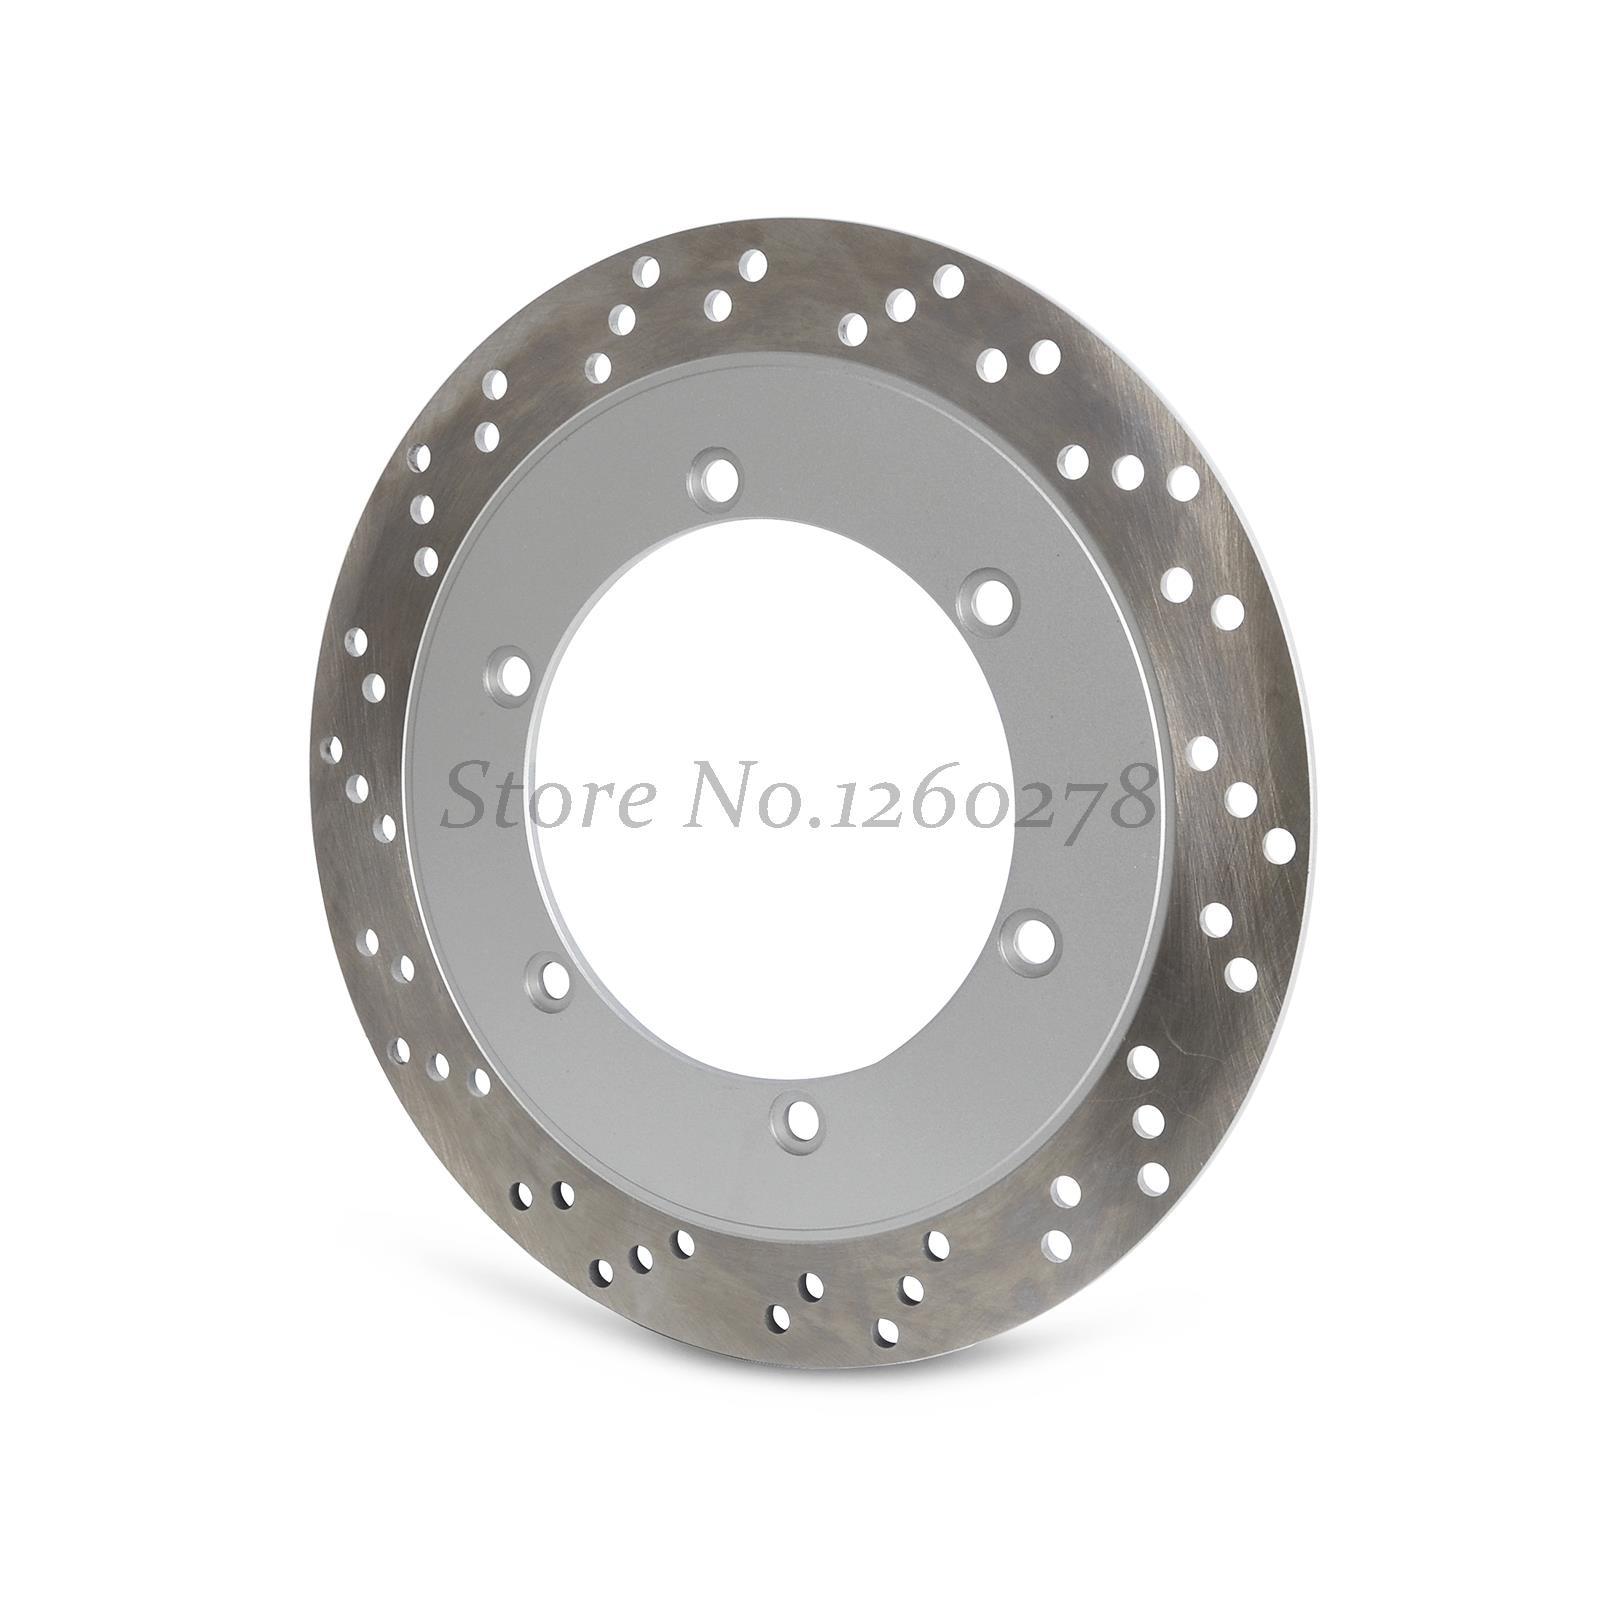 Rear Brake Disc Rotor For Honda VTX 1300 VTX1300 S3/S4/S5/S6/S7/S8 2003 2004 2005 2006 2007 2008 neo chrome rear lower control arm lca for honda civic 2001 2005 e2c